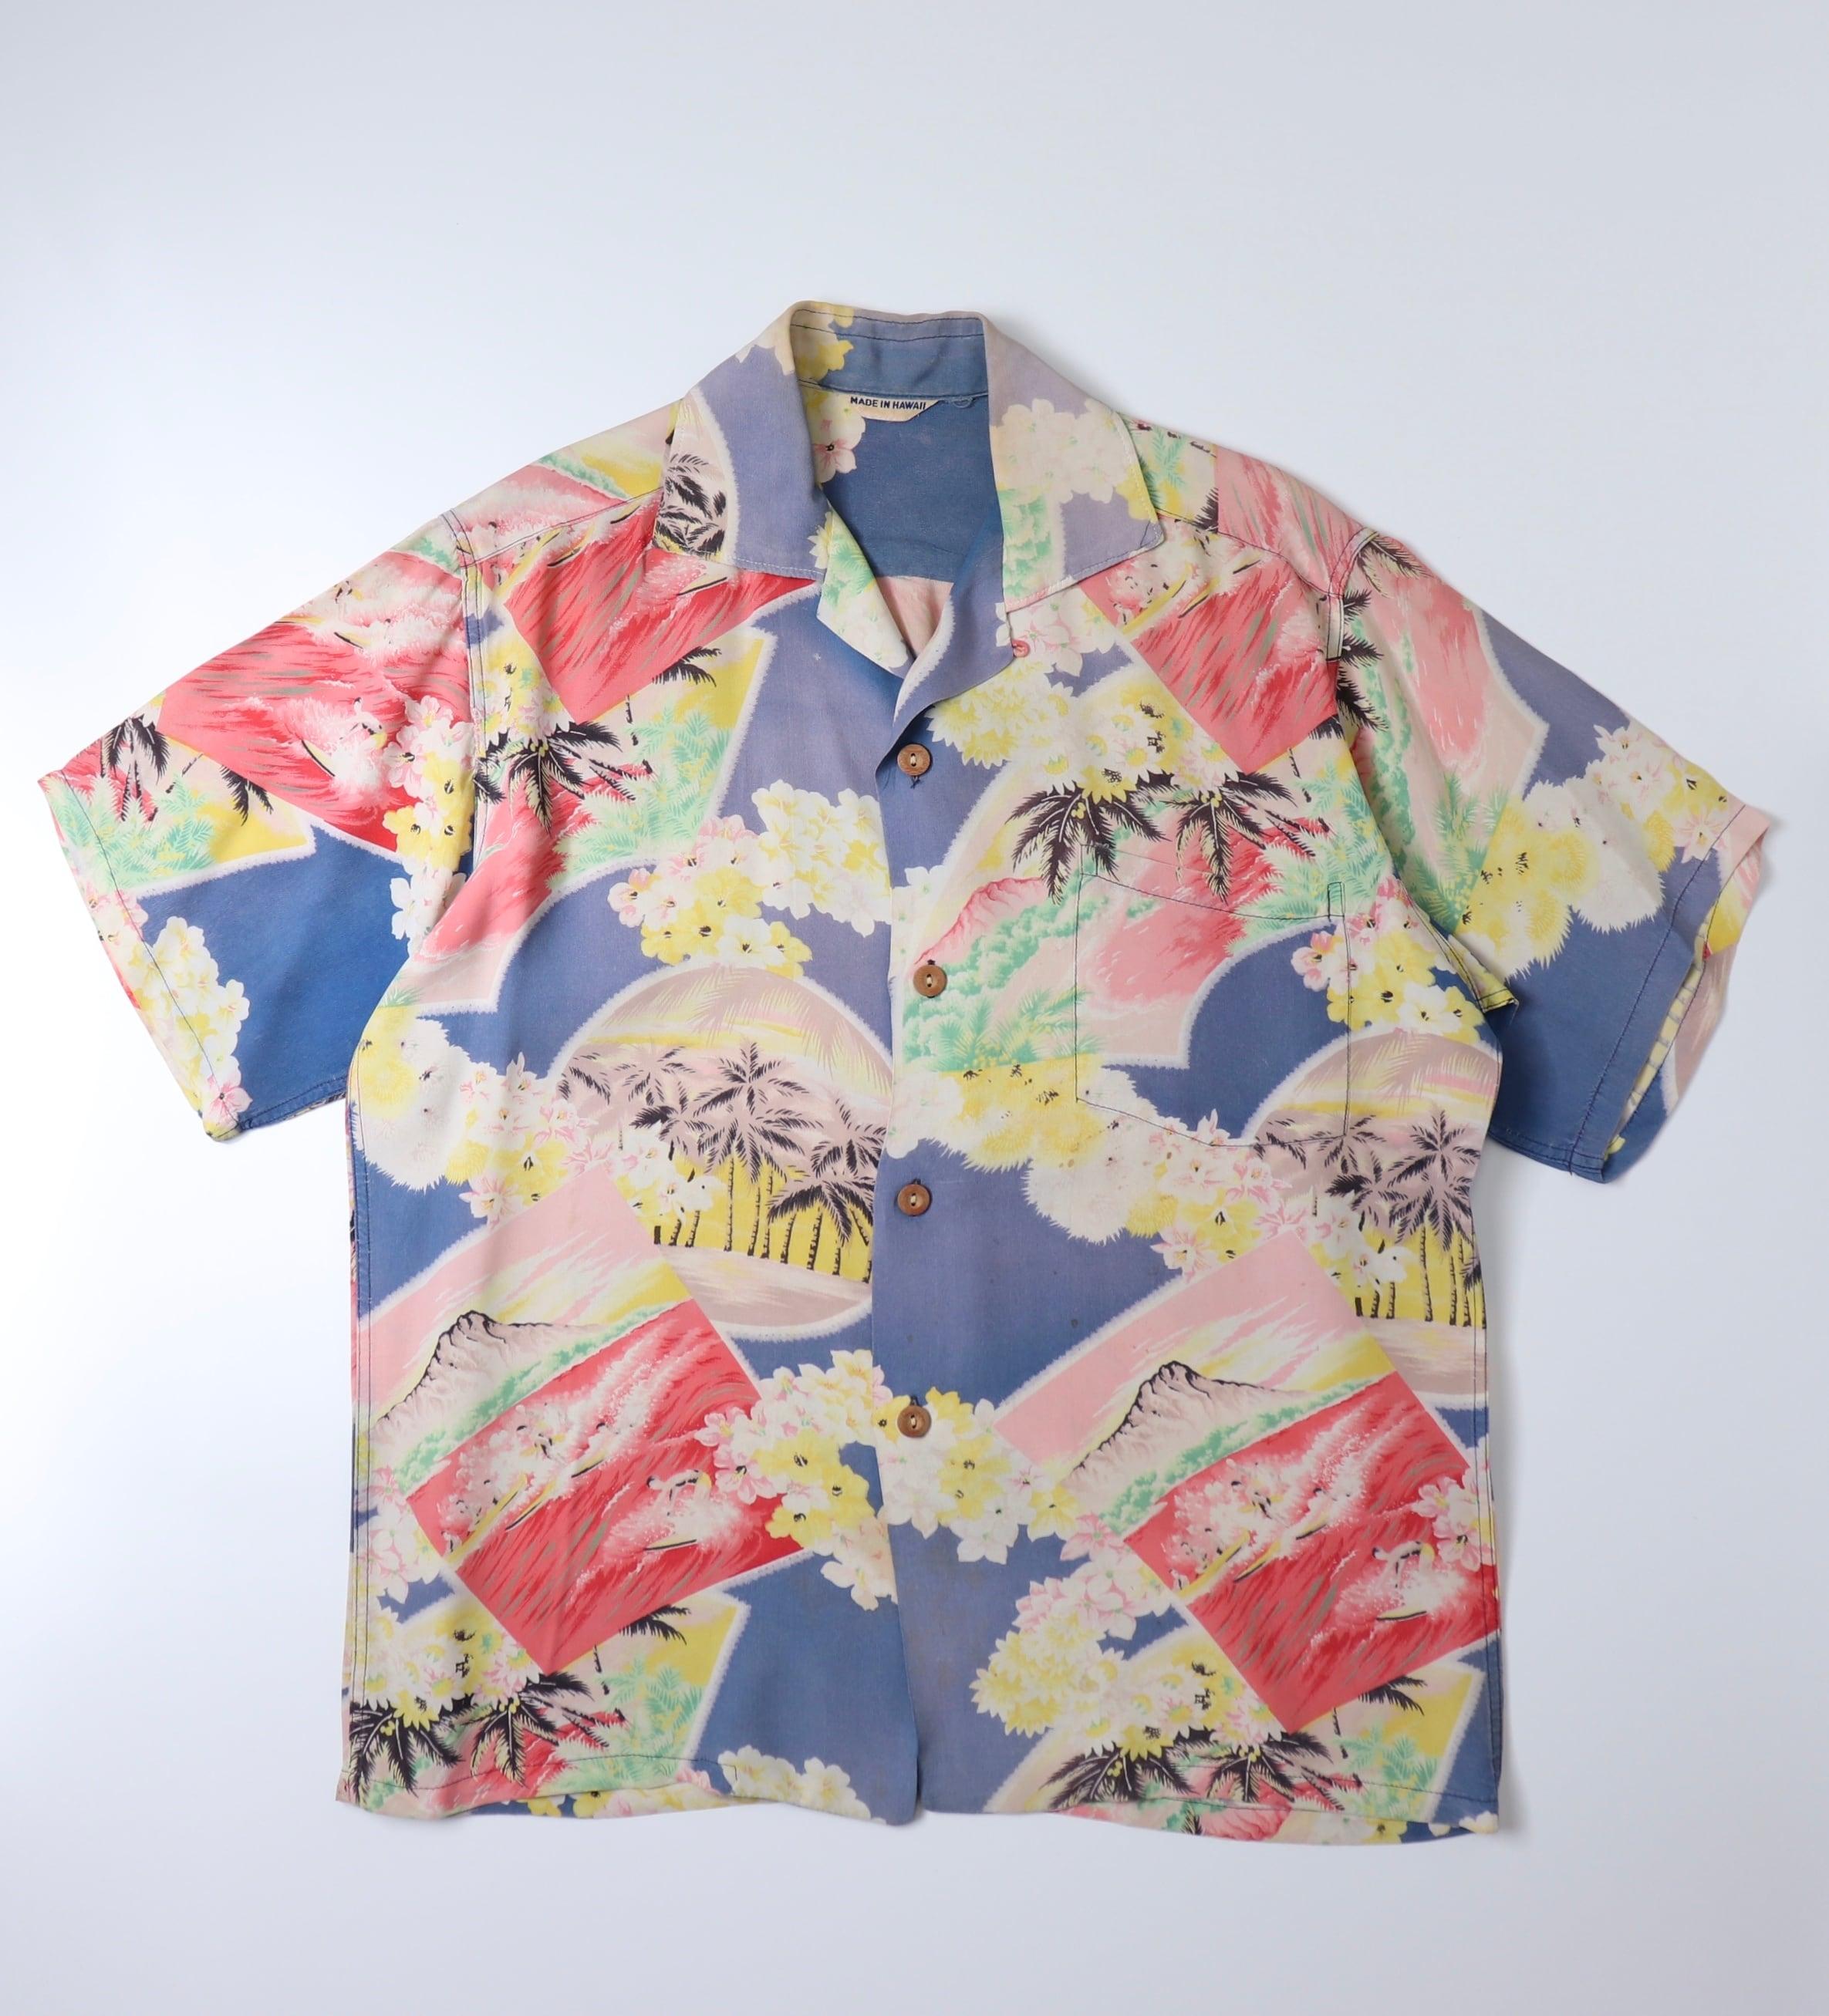 50s Aloha shirts 50年代 ヴィンテージ レーヨン アロハシャツ A767